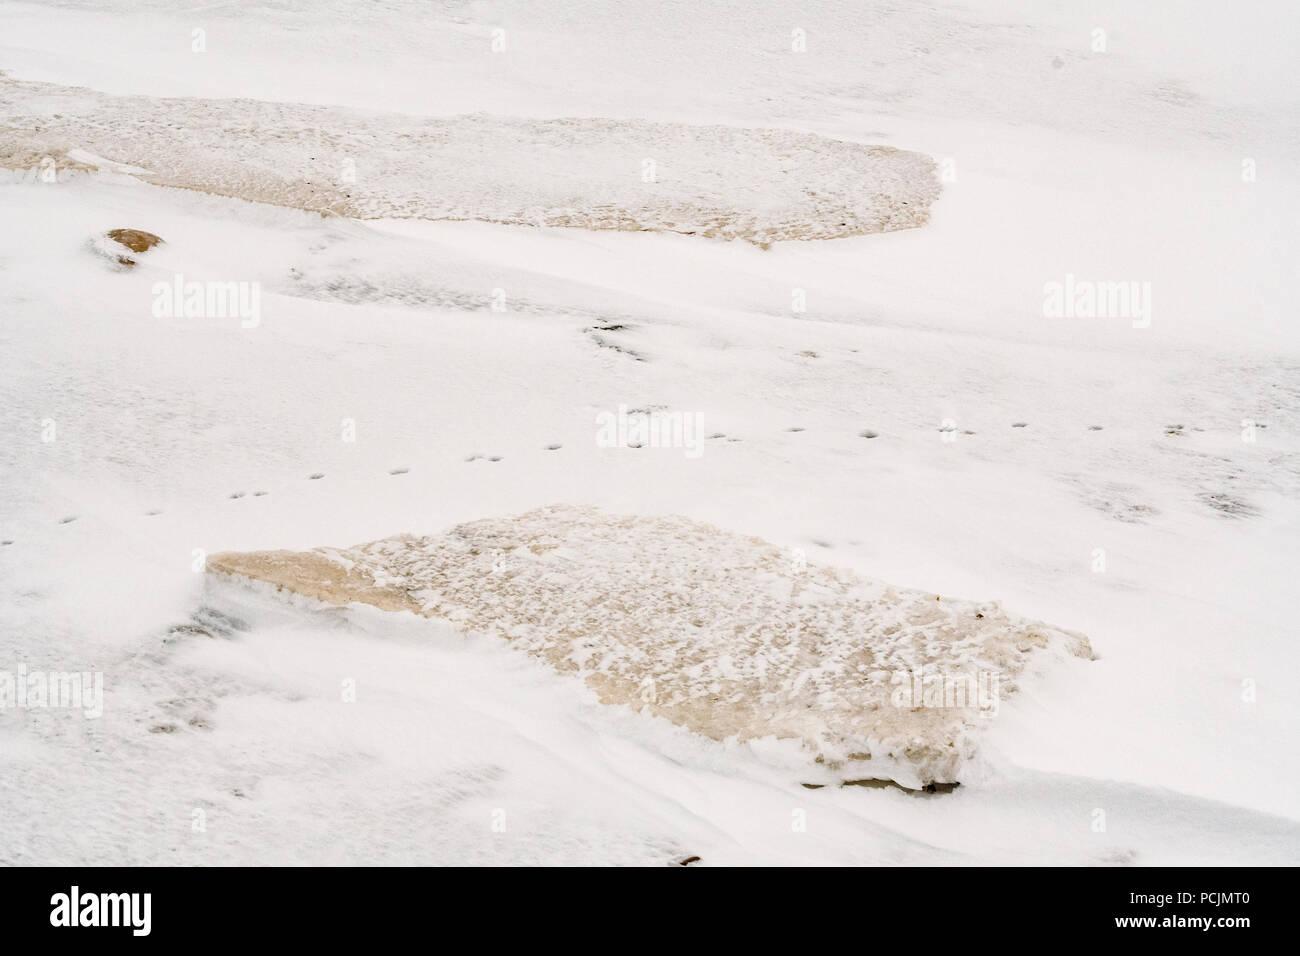 Hudson Bay coastline at freeze-up, Wapusk National Park, Cape Churchill, Manitoba, Canada - Stock Image